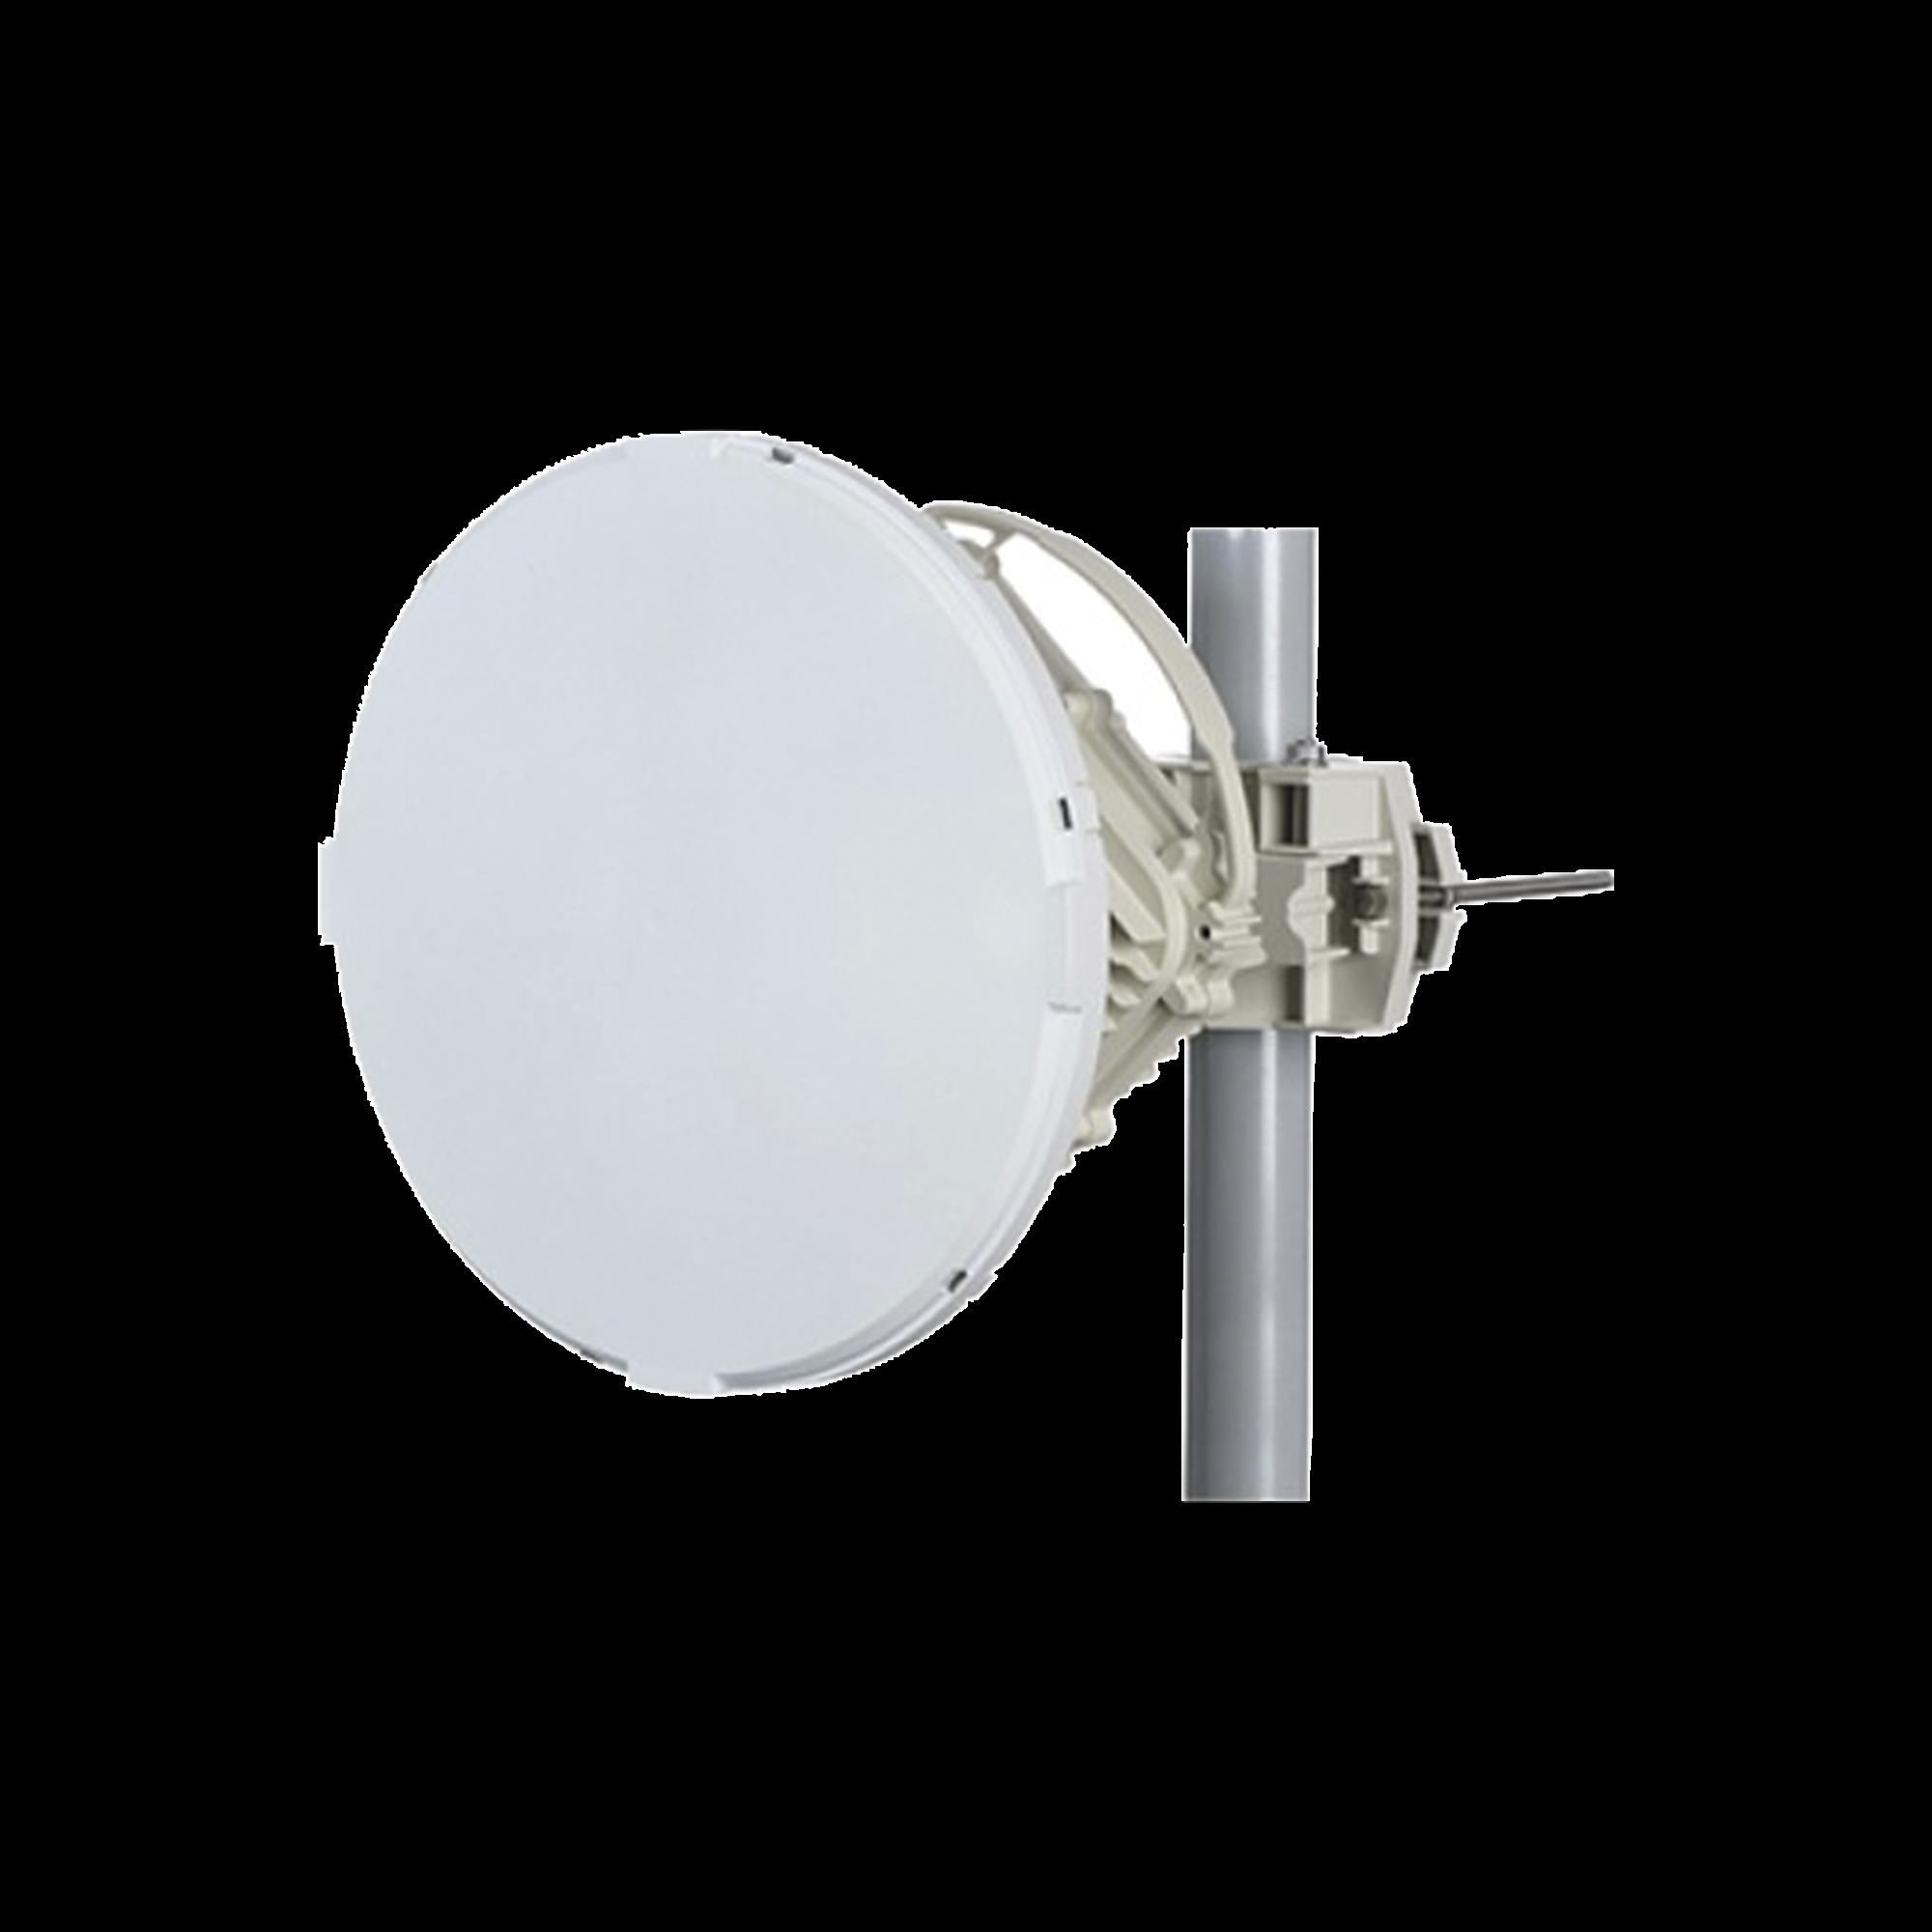 Antena Etherhaul de 1 pie. (FCC/ETSI)